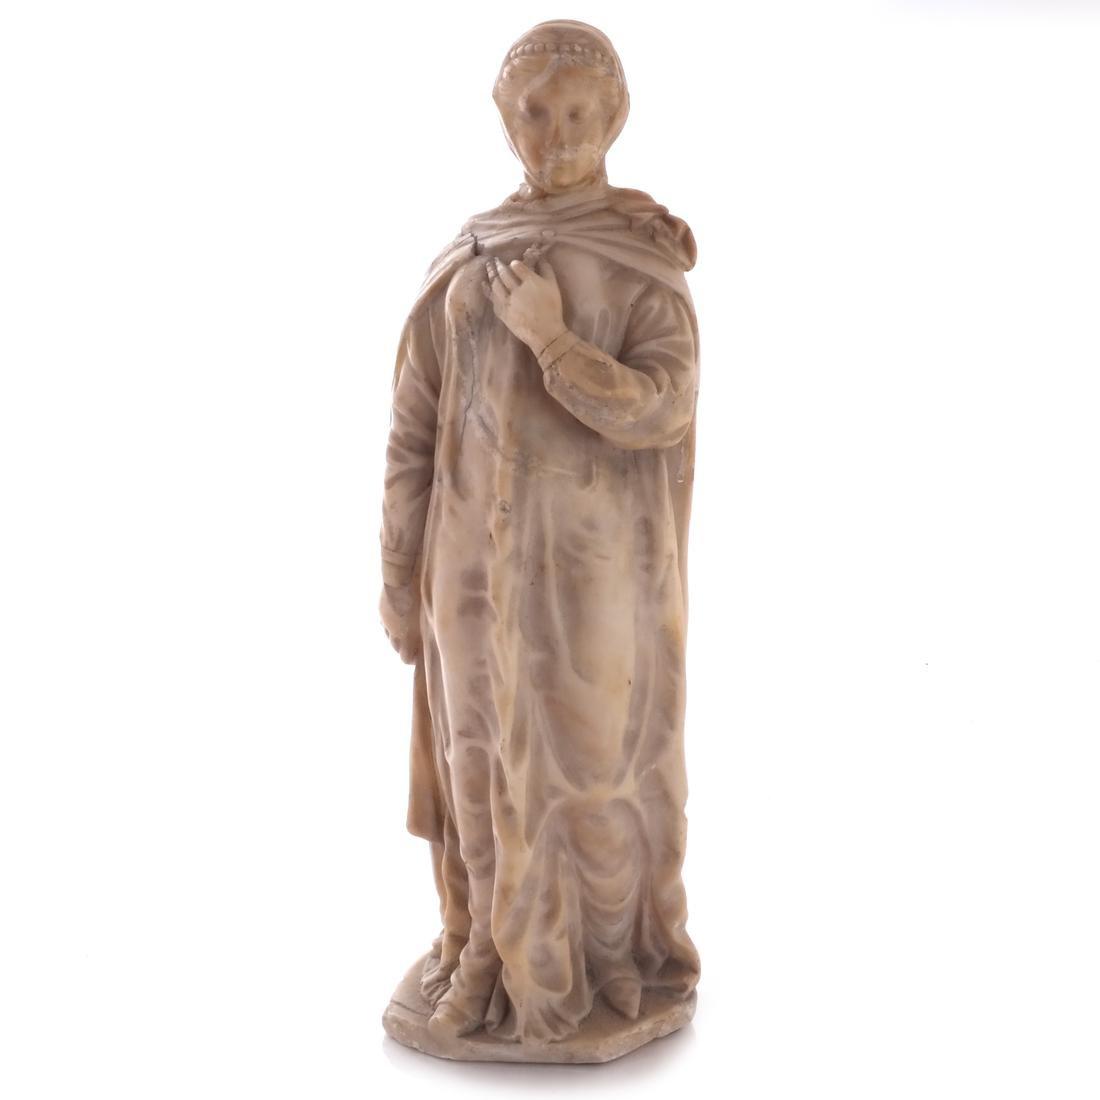 Italian Marble Figure of Beatrice